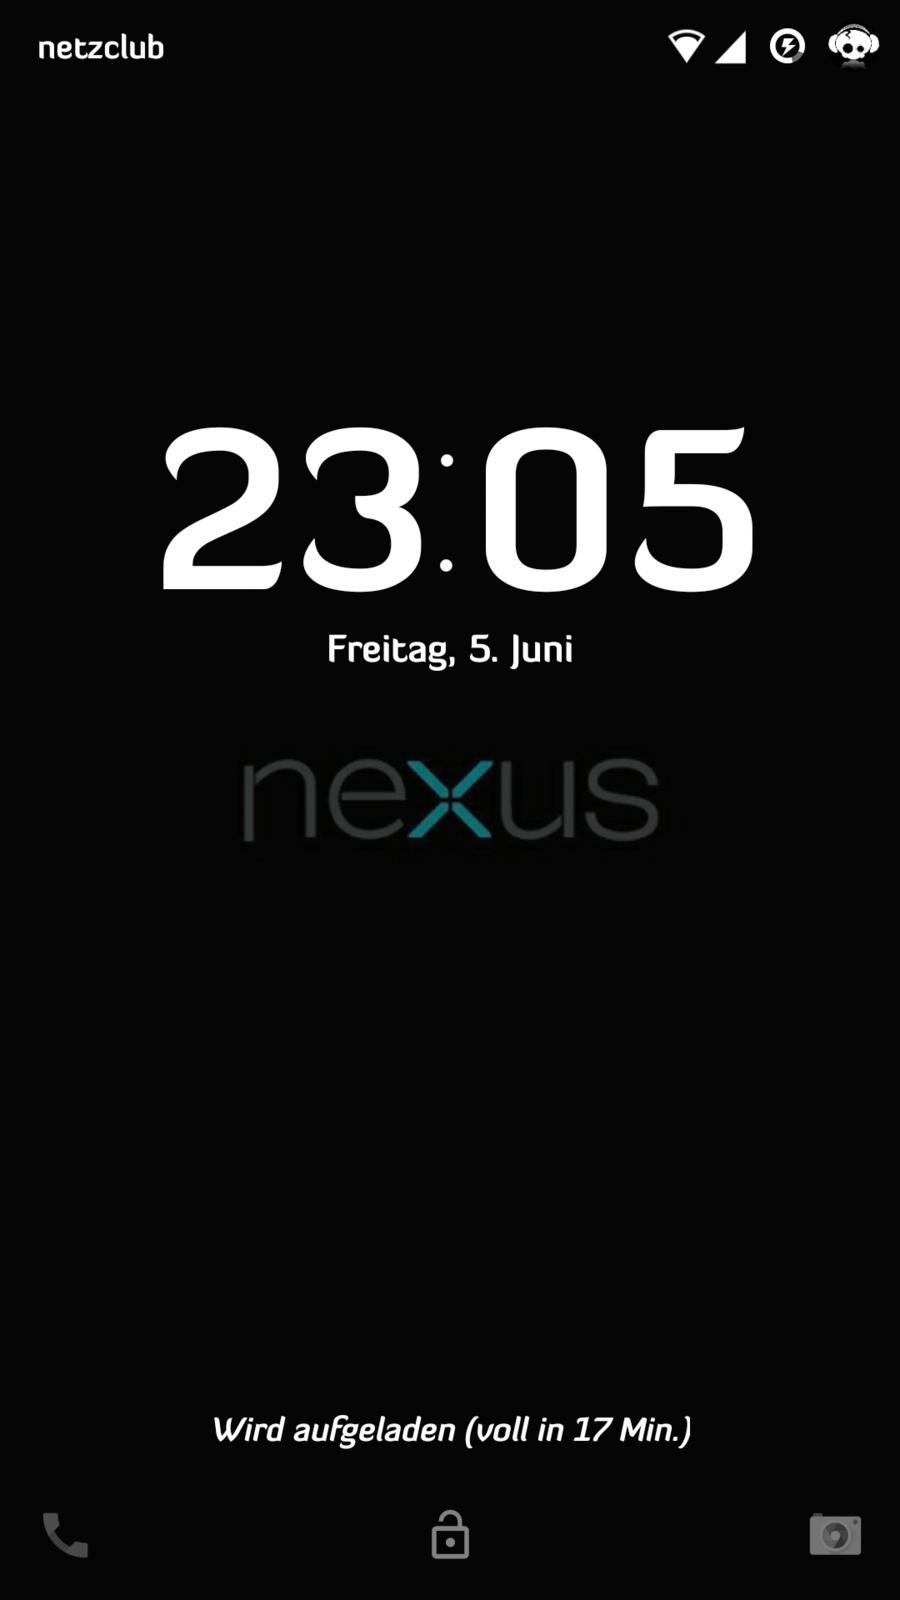 Screenshot_2015-06-05-23-05-40.png